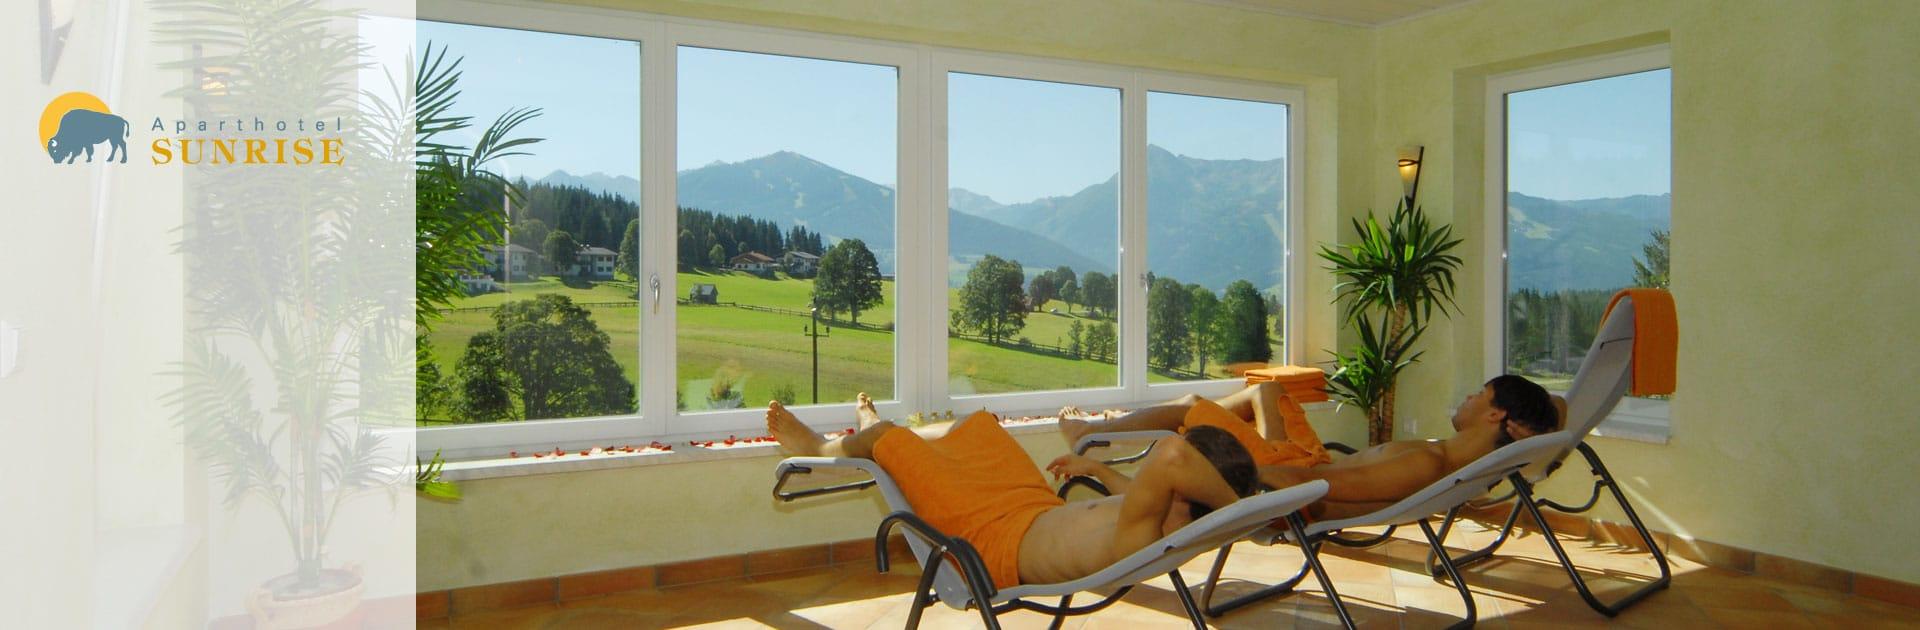 Ruheraum im Wellnessbereich im Aparthotel Sunrise in Ramsau am Dachstein